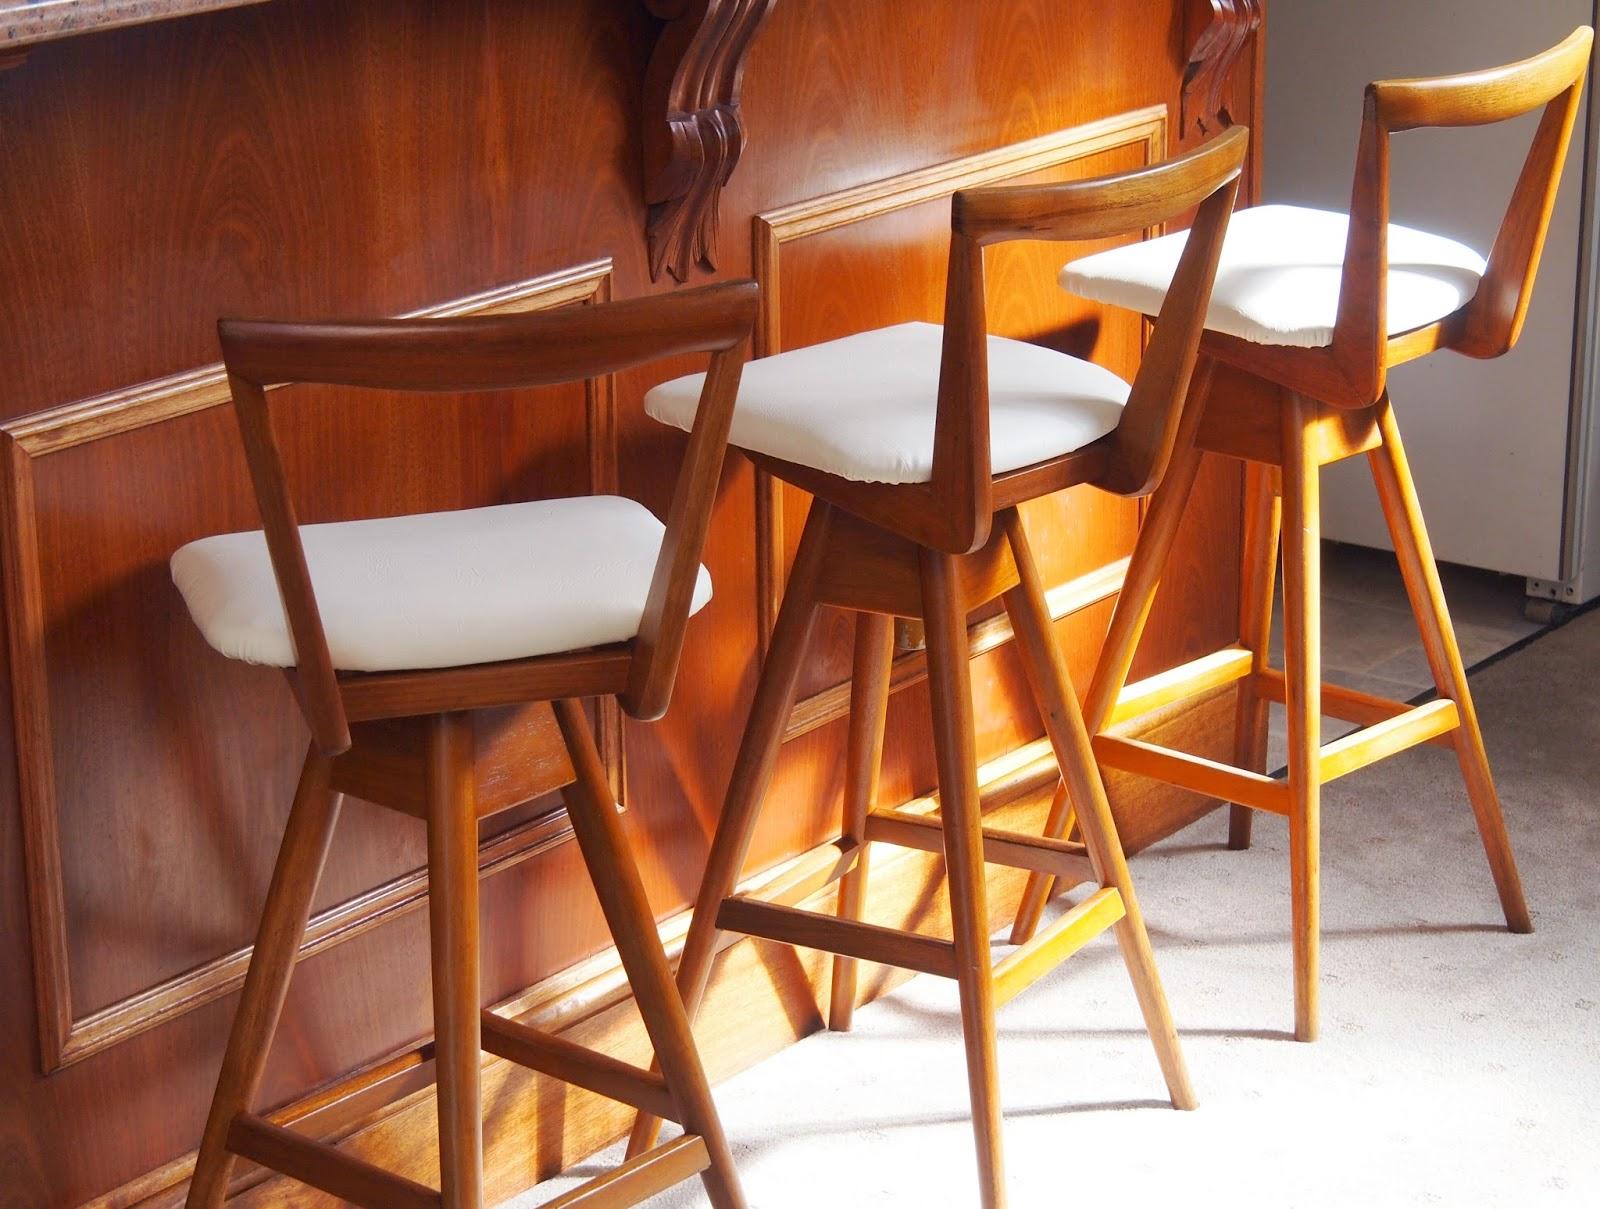 bar stools re-purposed